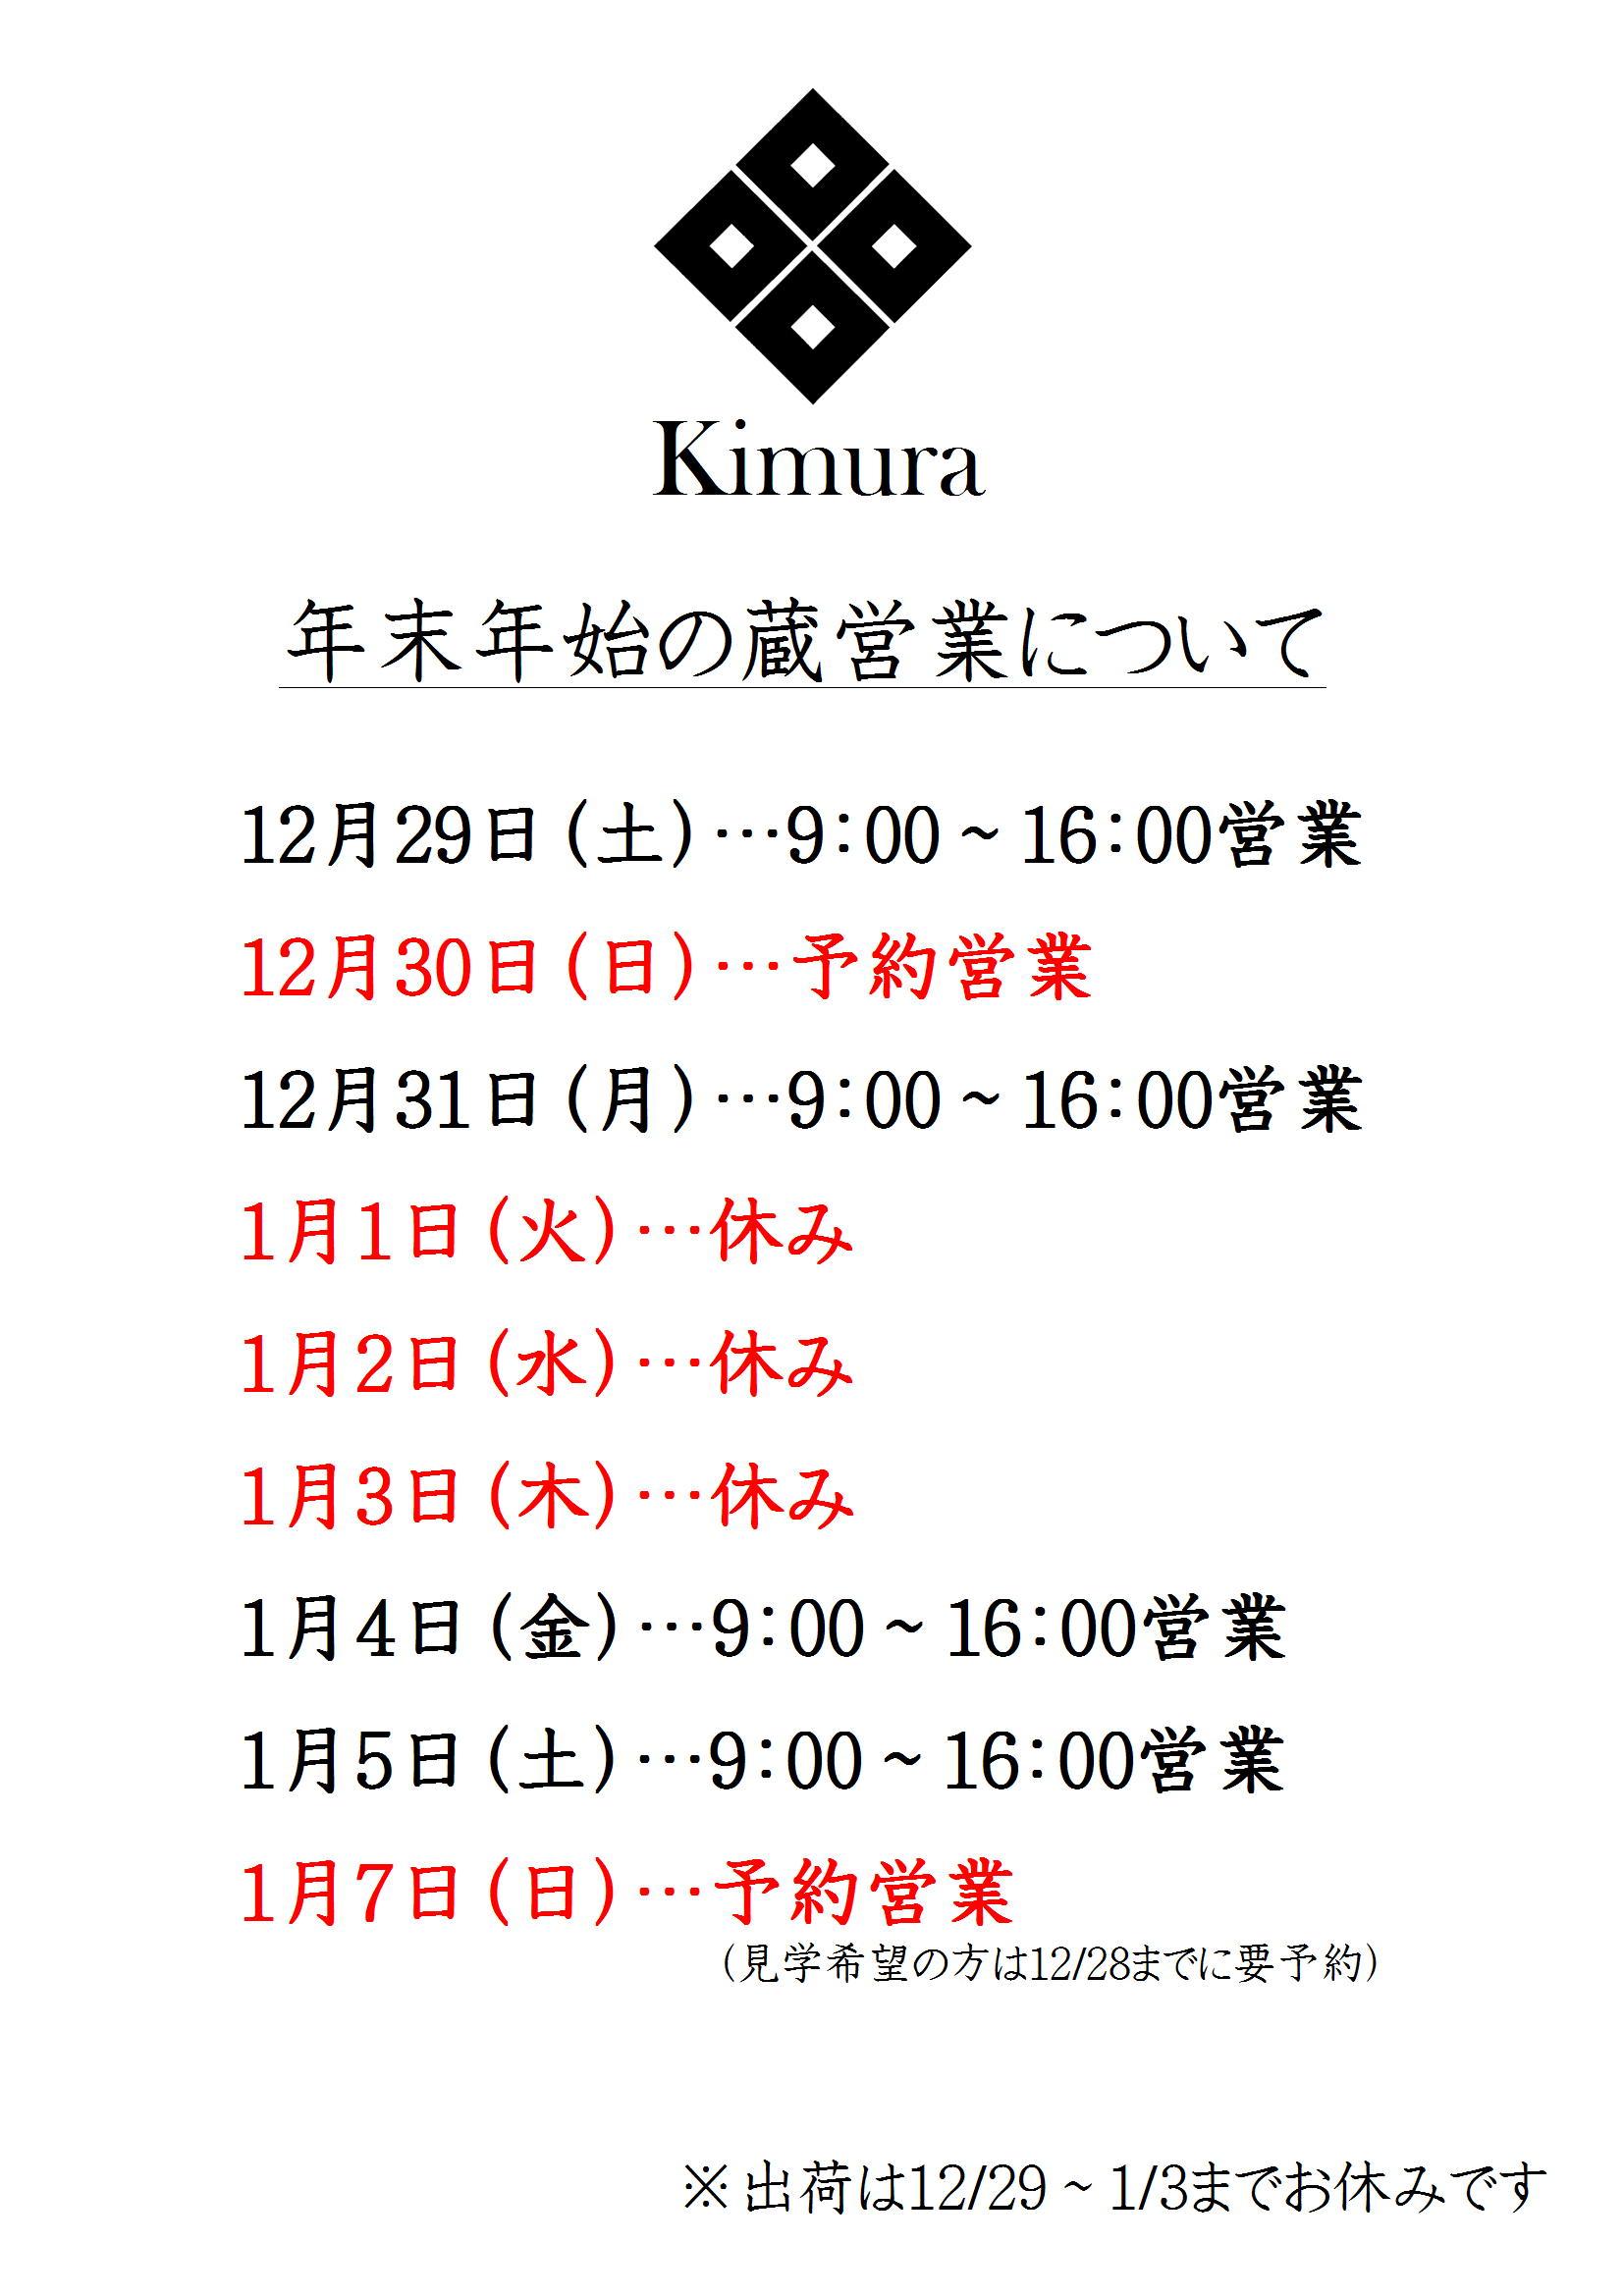 http://www.fukukomachi.com/blog/photo/20181215.JPG